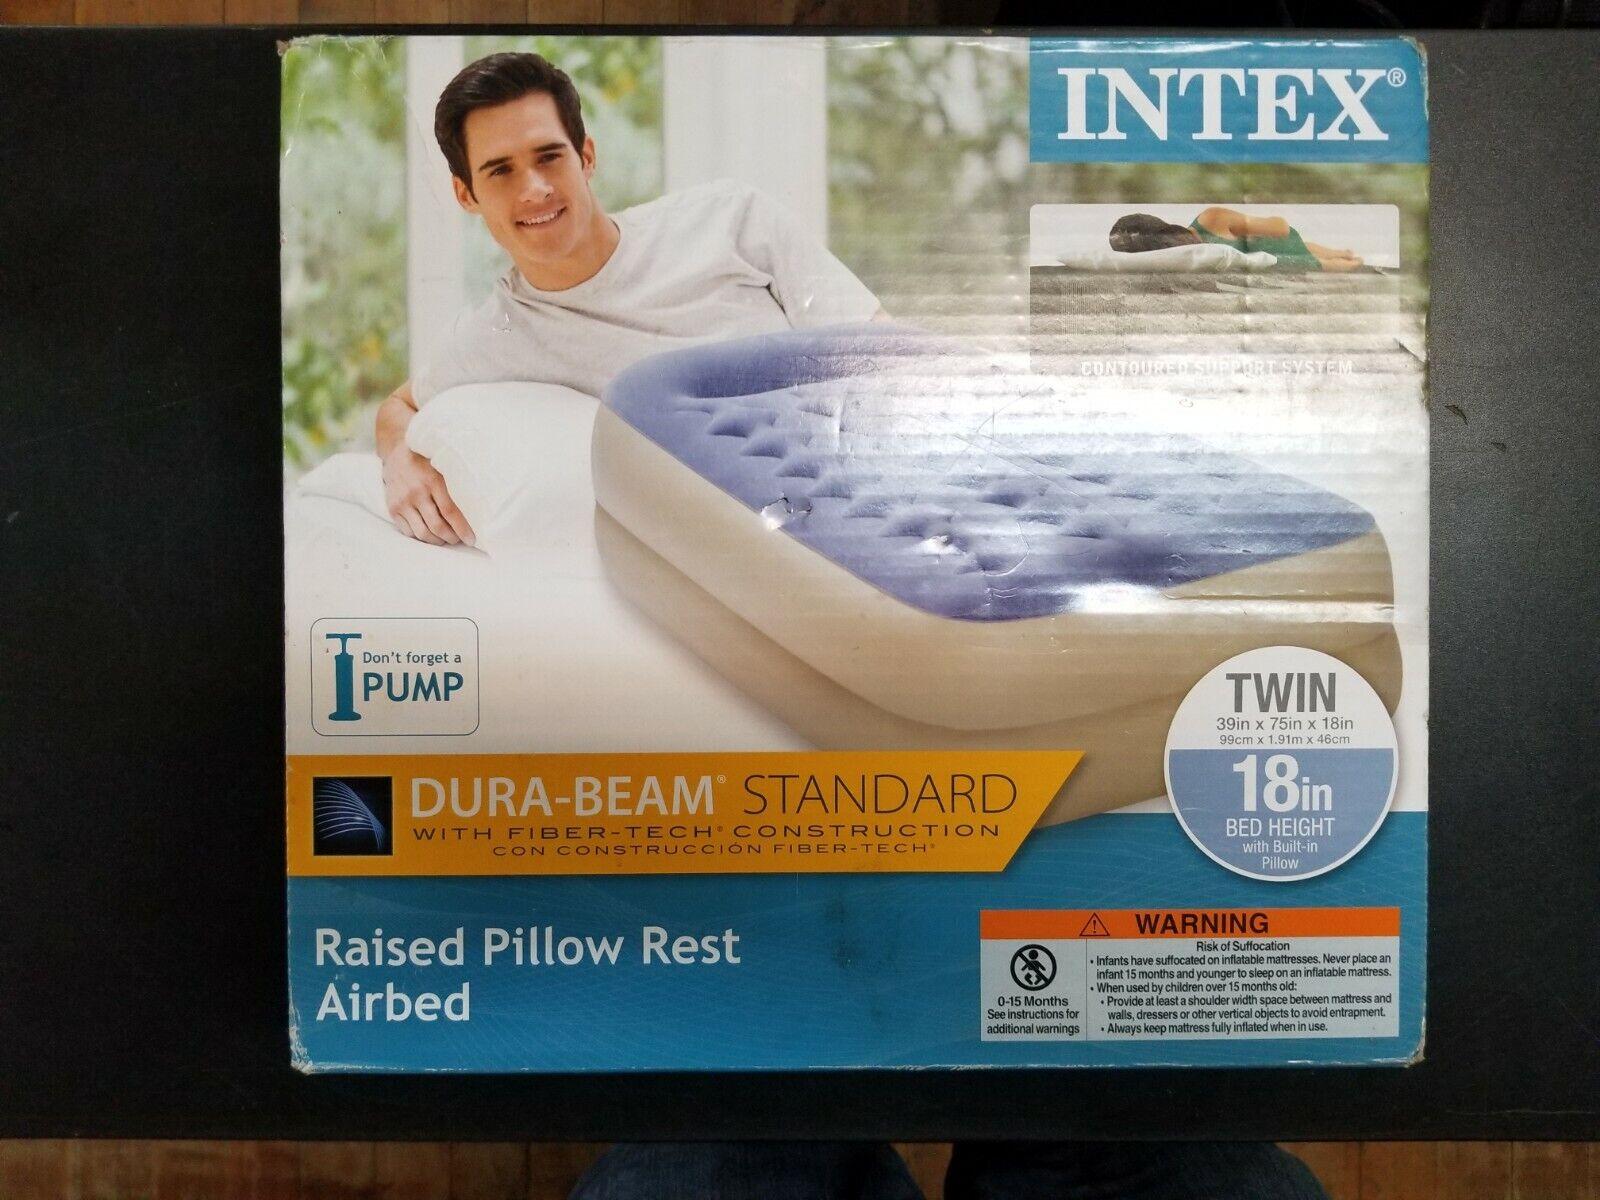 "INTEX TWIN 18"" DURA-BEAM STANDARD PILLOW RAISED AIR MATTRESS"